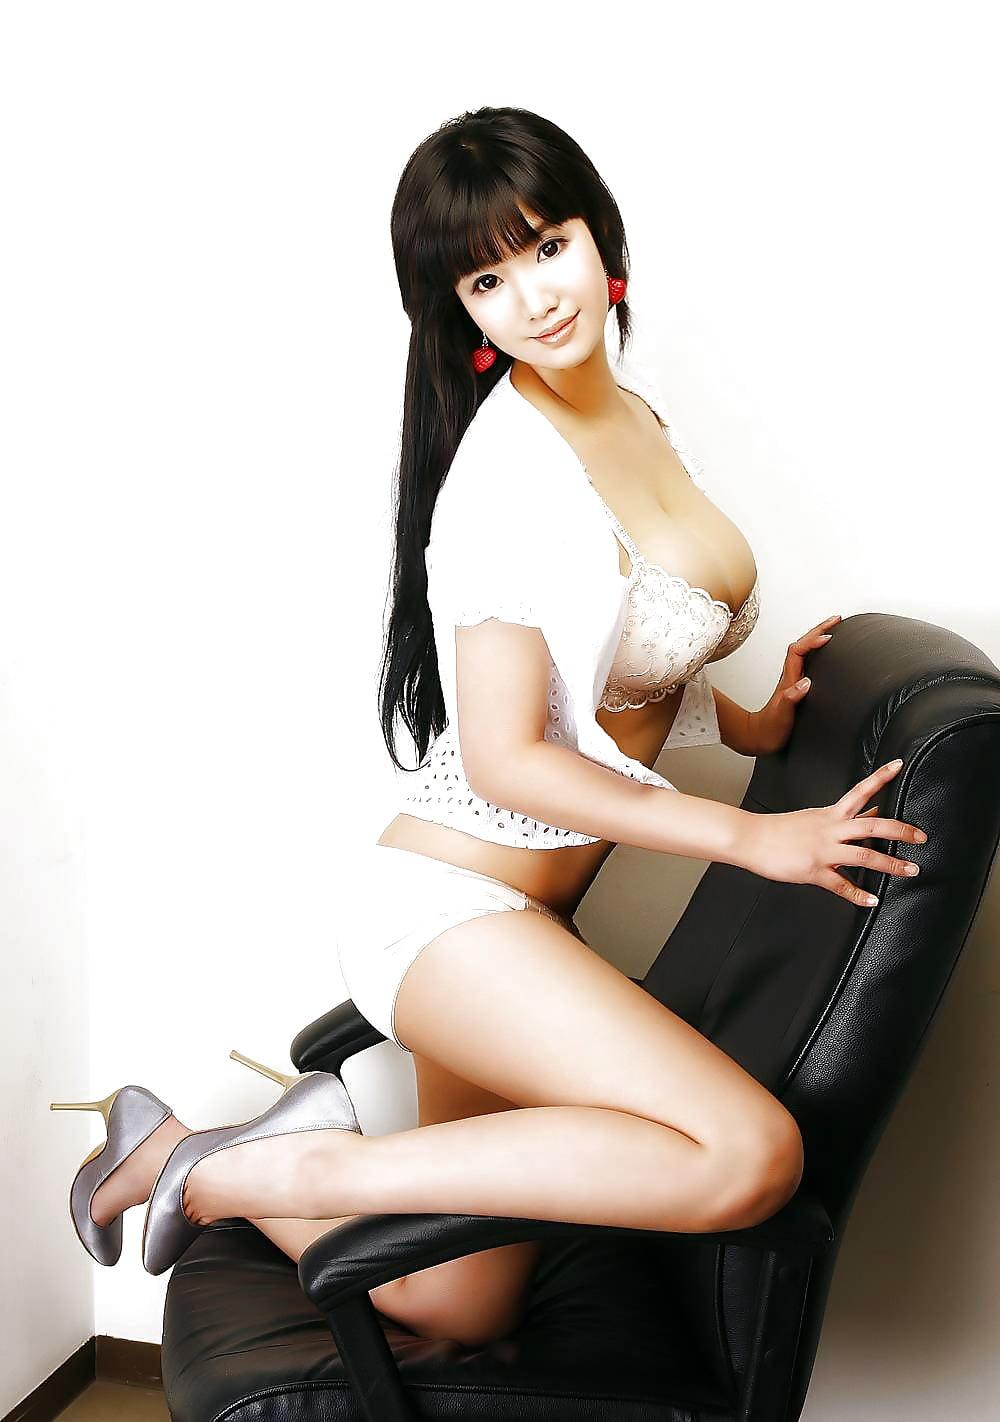 Korean hot girls boobs-3152